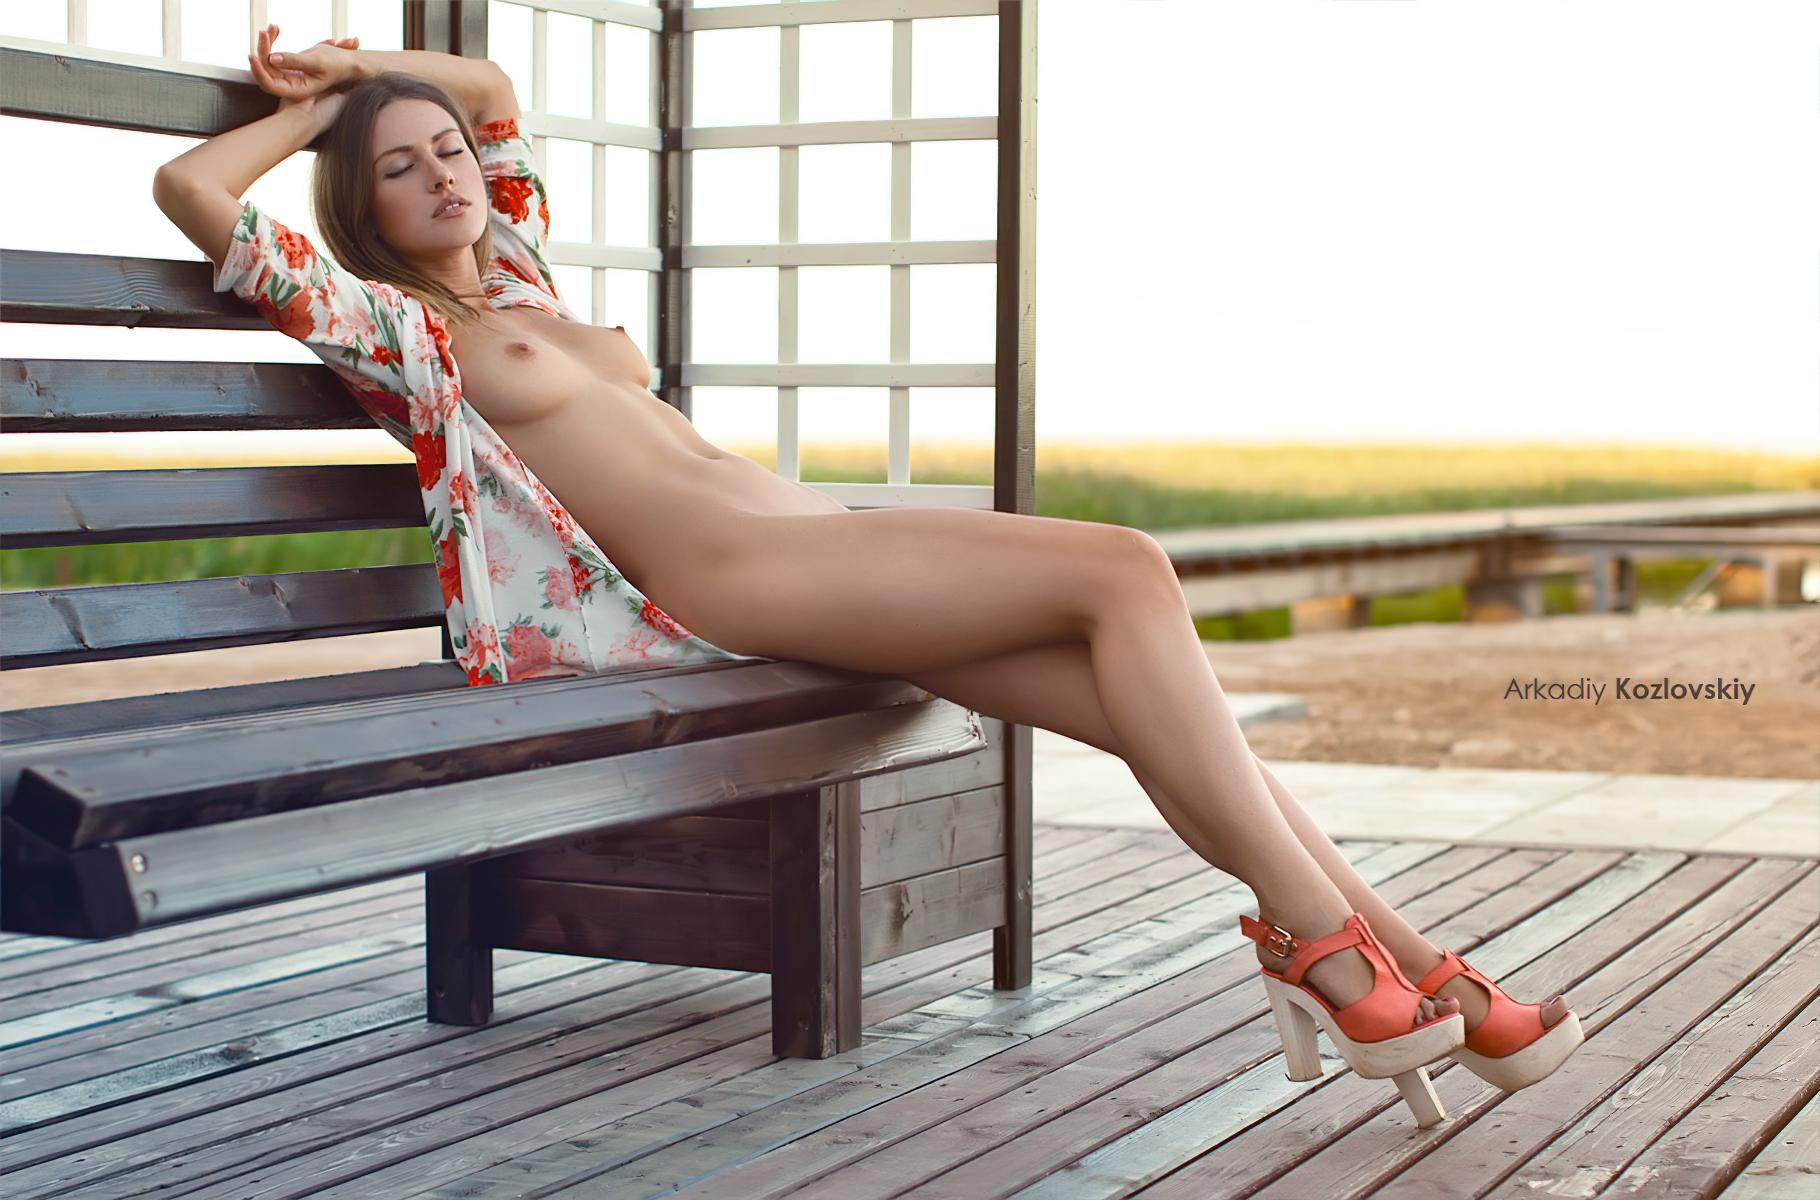 girls-naked-high-heels-pussy-mix-vol2-91